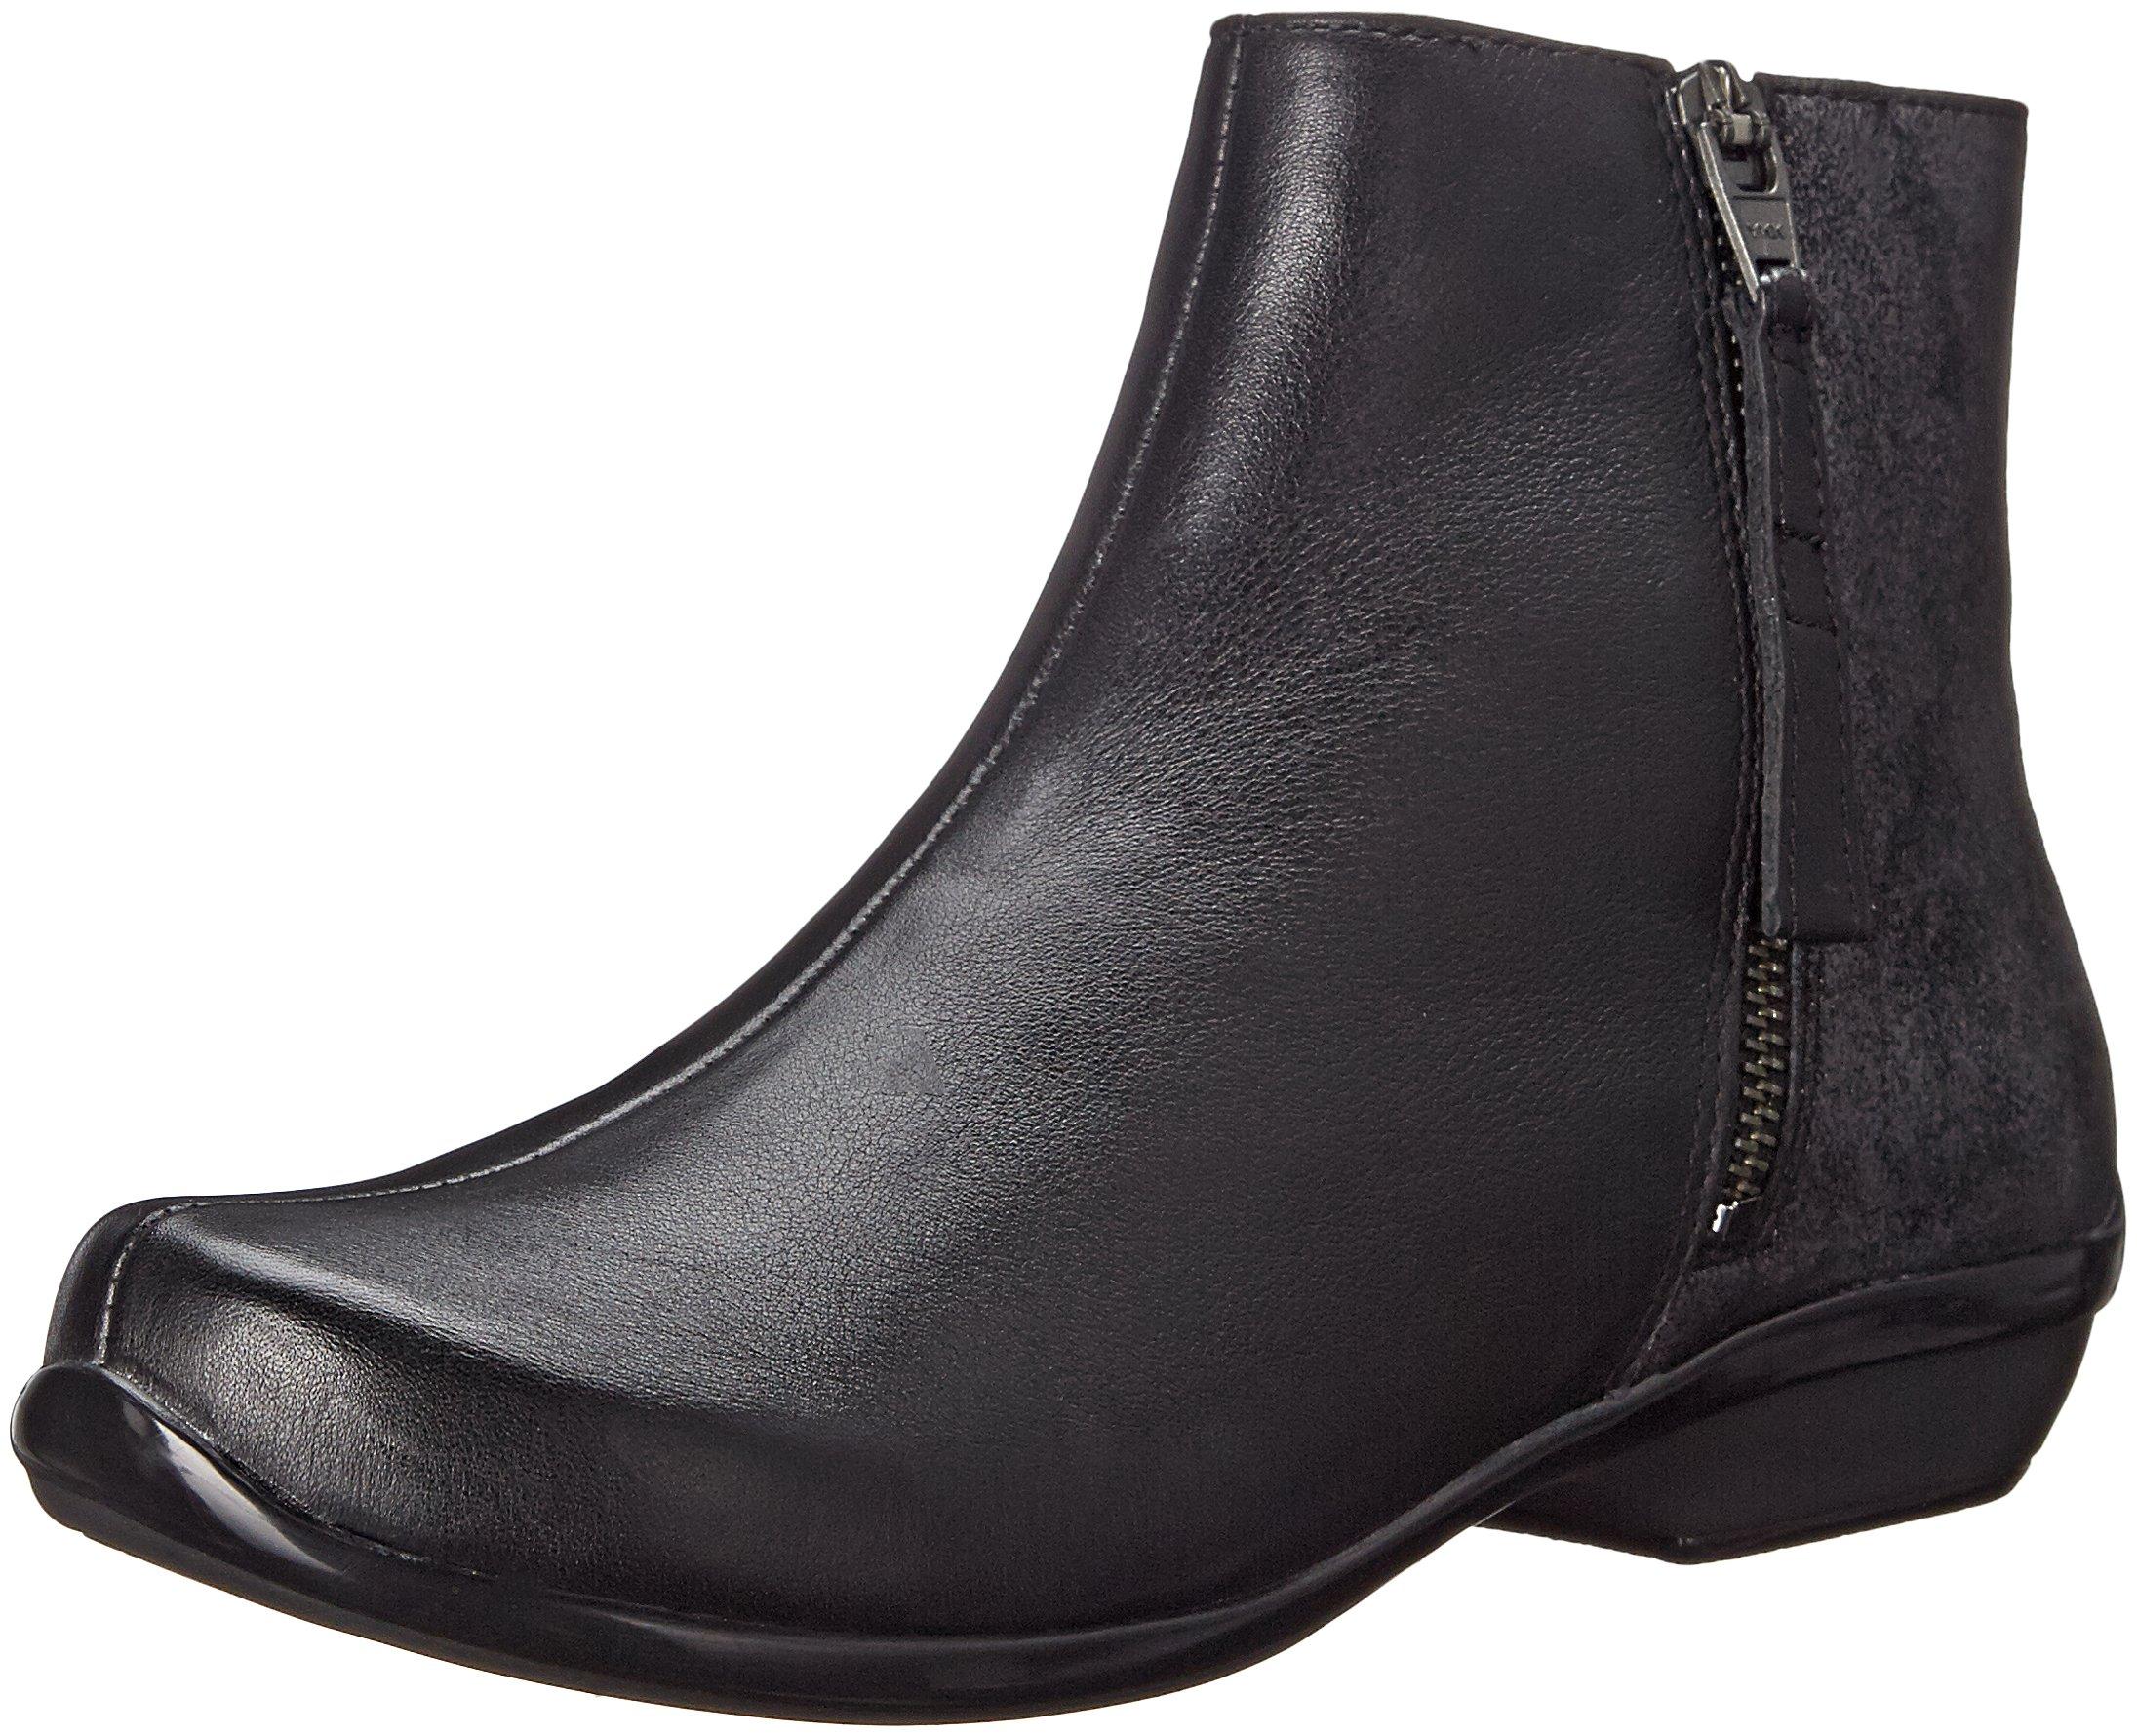 Dansko Women's Otis Boot, Black Nappa, 39 EU/8.5-9 M US